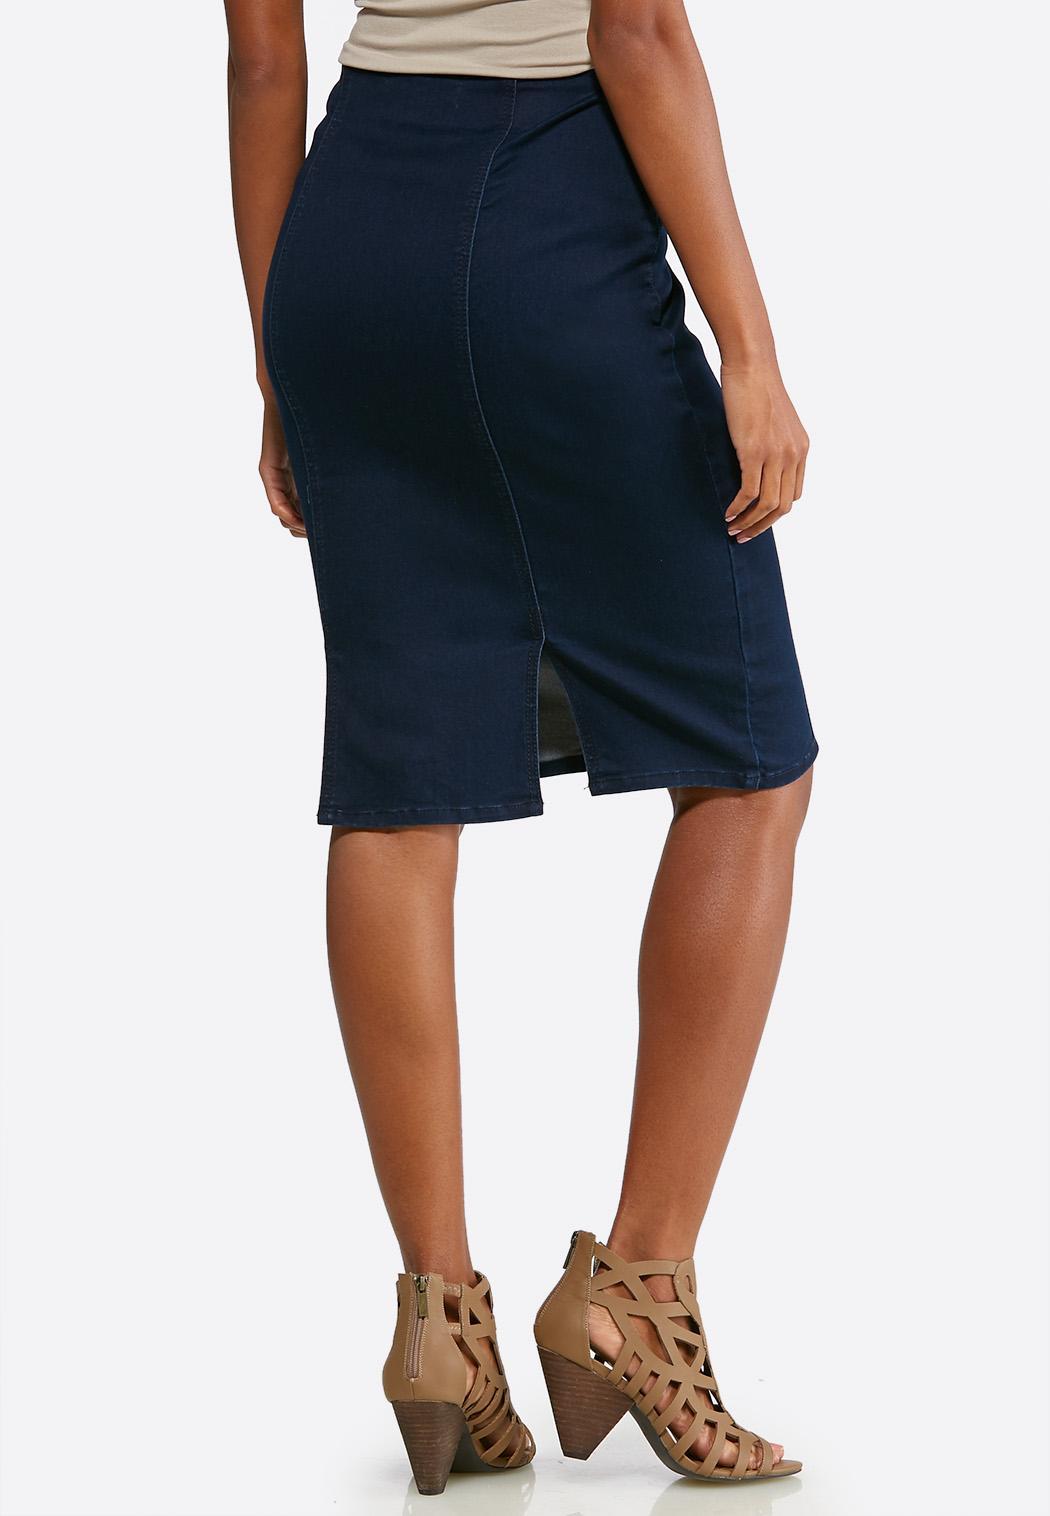 Pull-On Denim Pencil Skirt (Item #43710591)